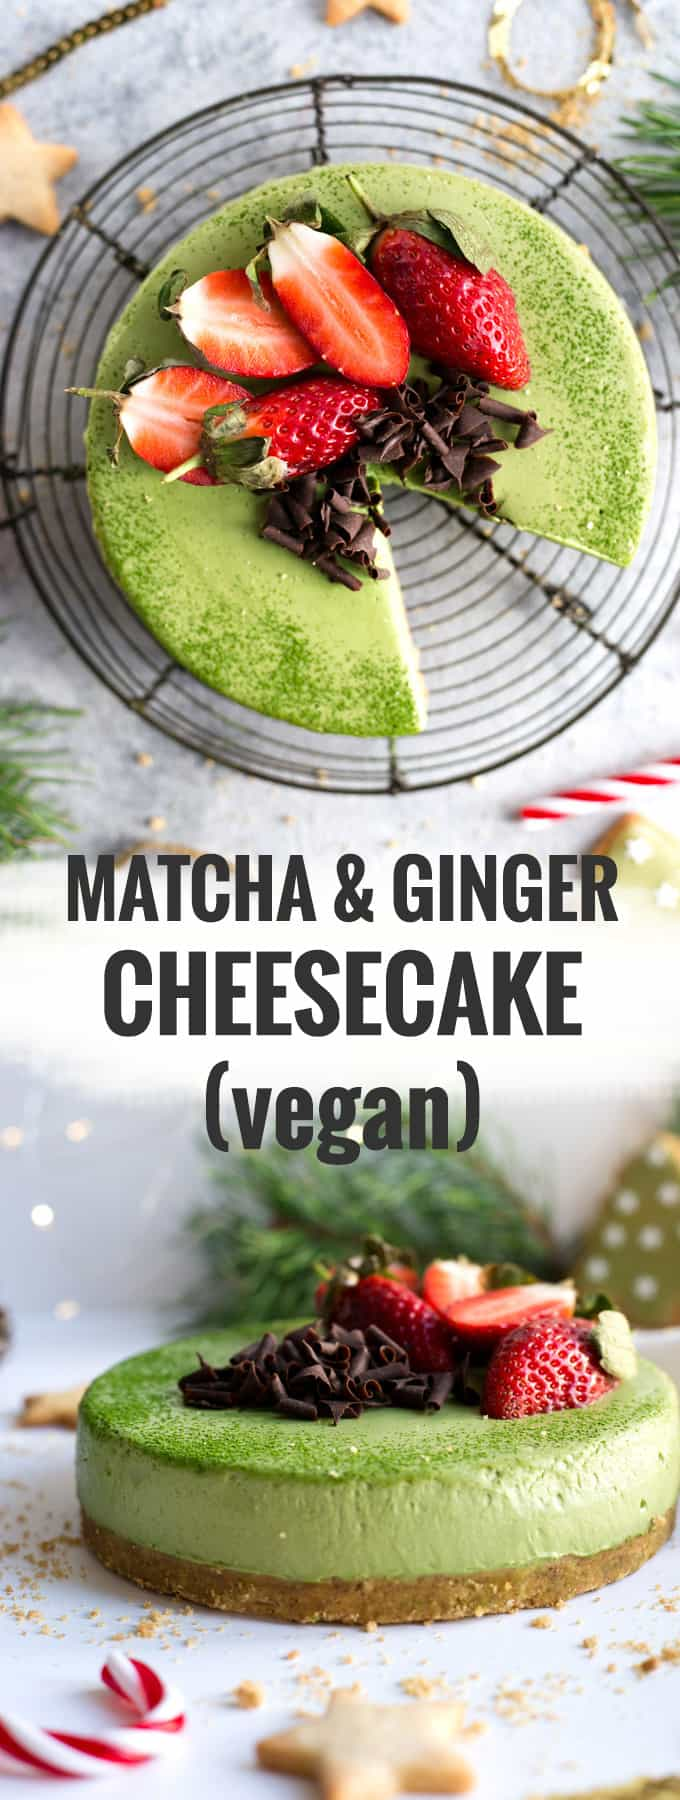 Delicious matcha cheesecake with ginger flavoured base. Velvety smooth and creamy cake, 100% vegan! #cheesecake #matcha #vegan #dairyfree